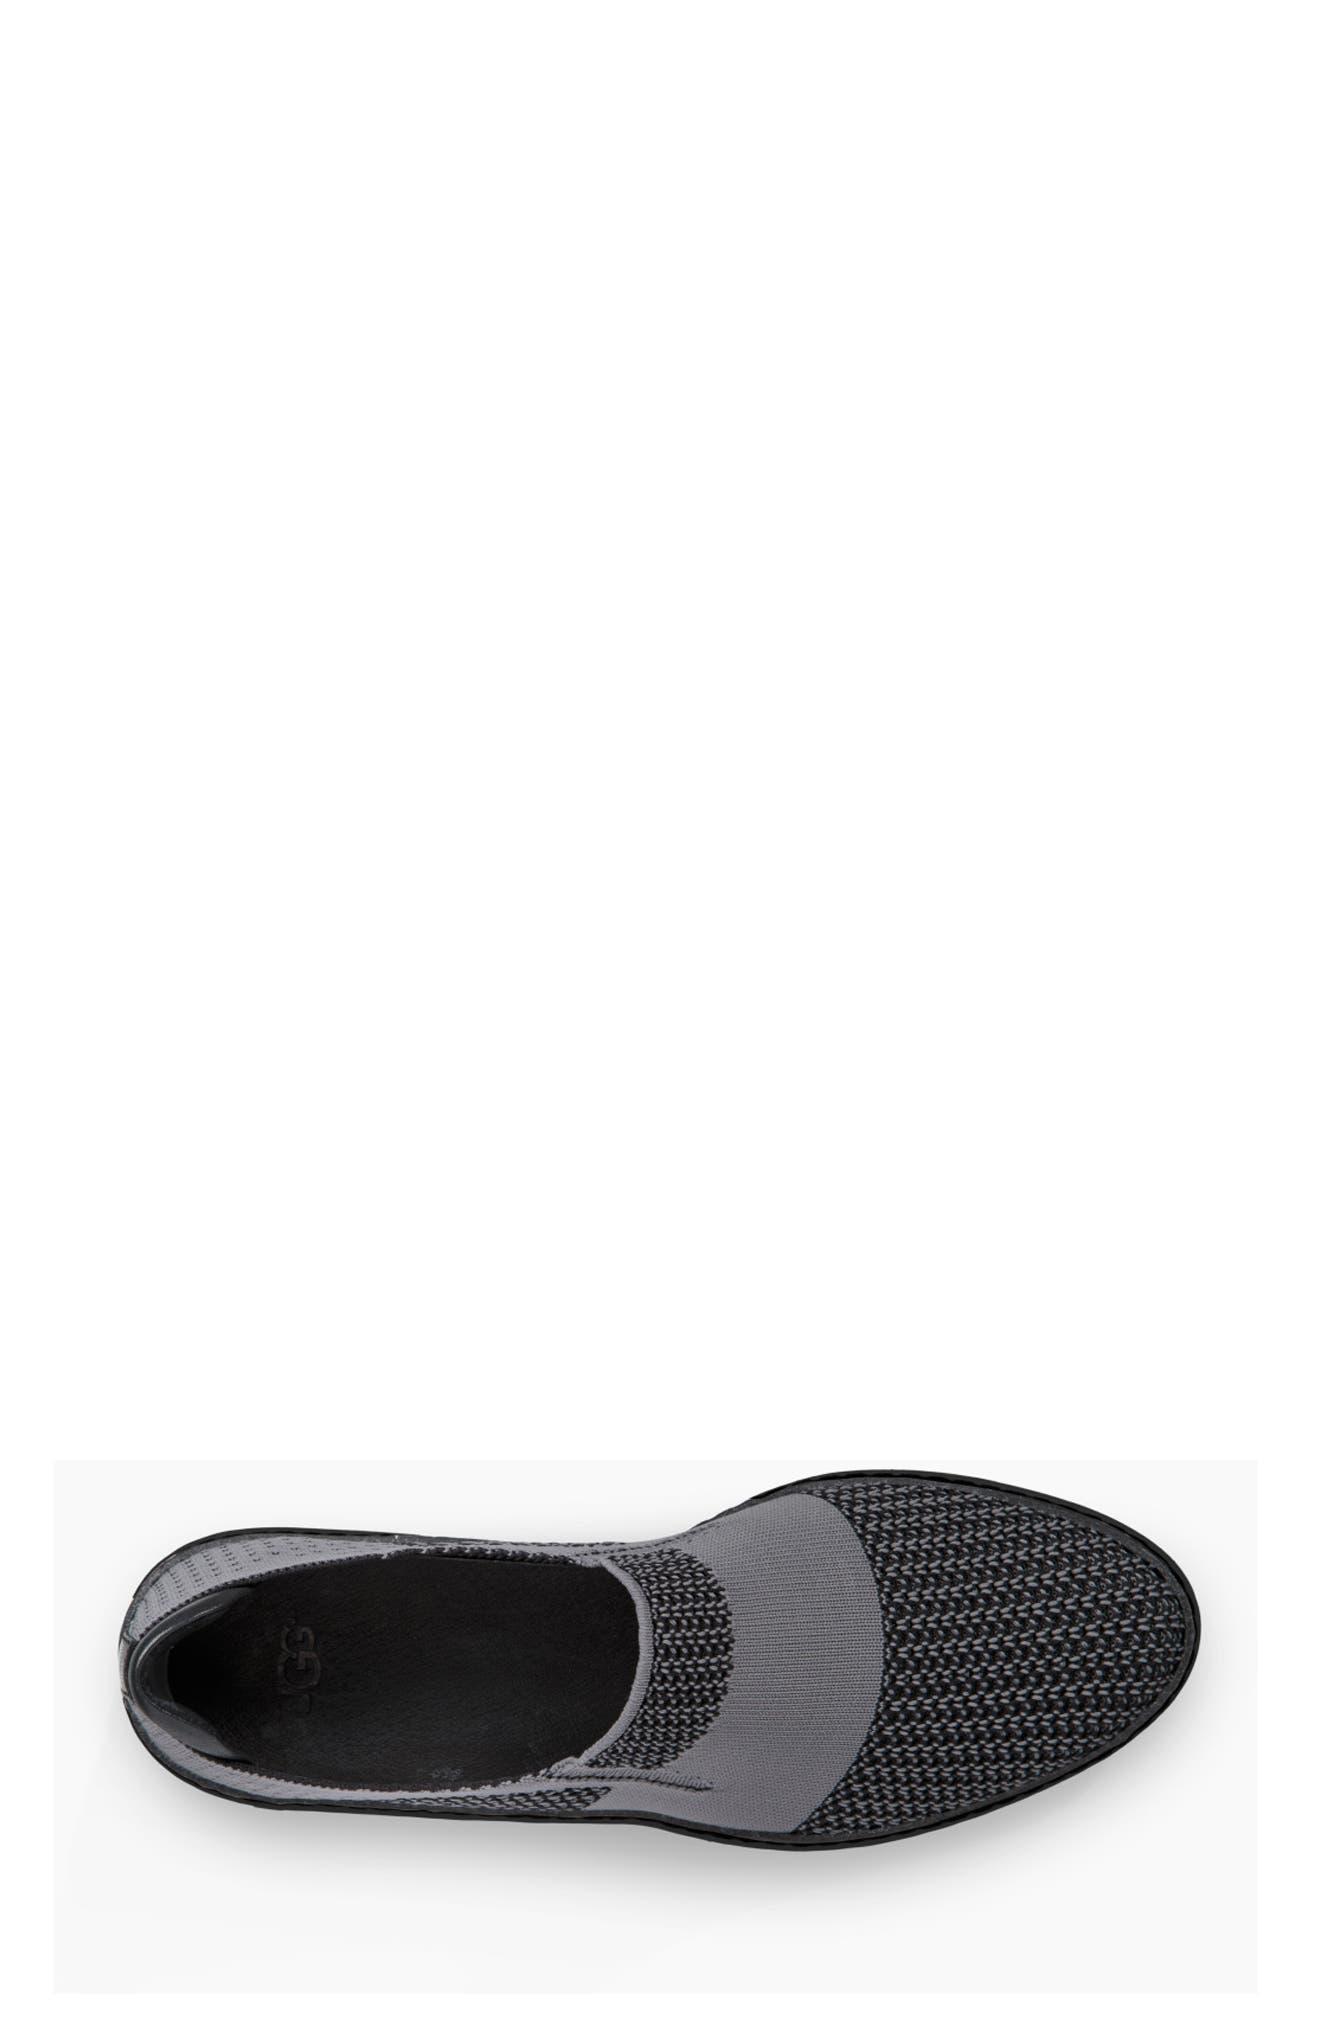 Sammy Sneaker,                             Alternate thumbnail 4, color,                             BLACK/ BLACK FABRIC